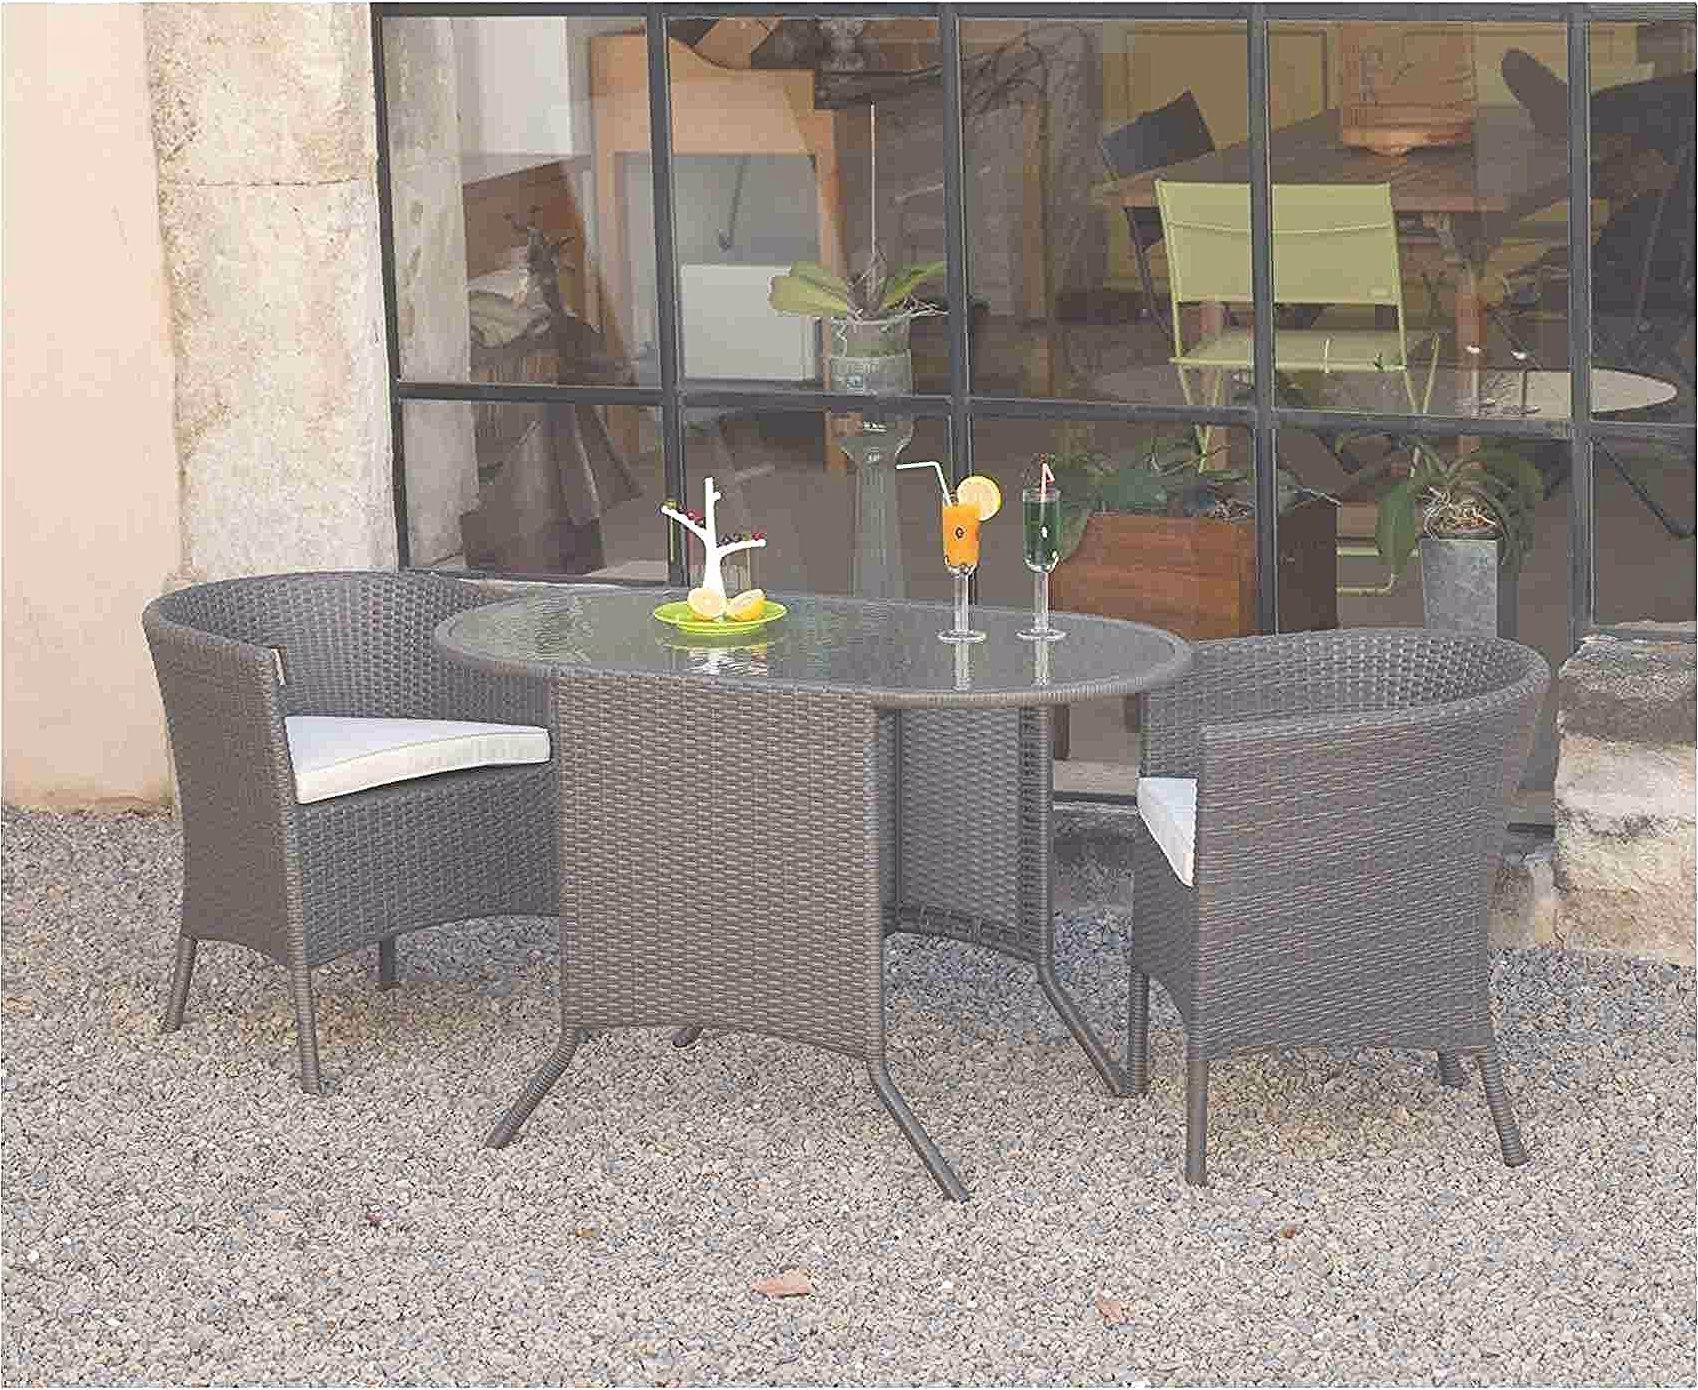 79 Glamorous Mobilier Jardin Leclerc   Outdoor Furniture ... concernant Mobilier De Jardin Leclerc